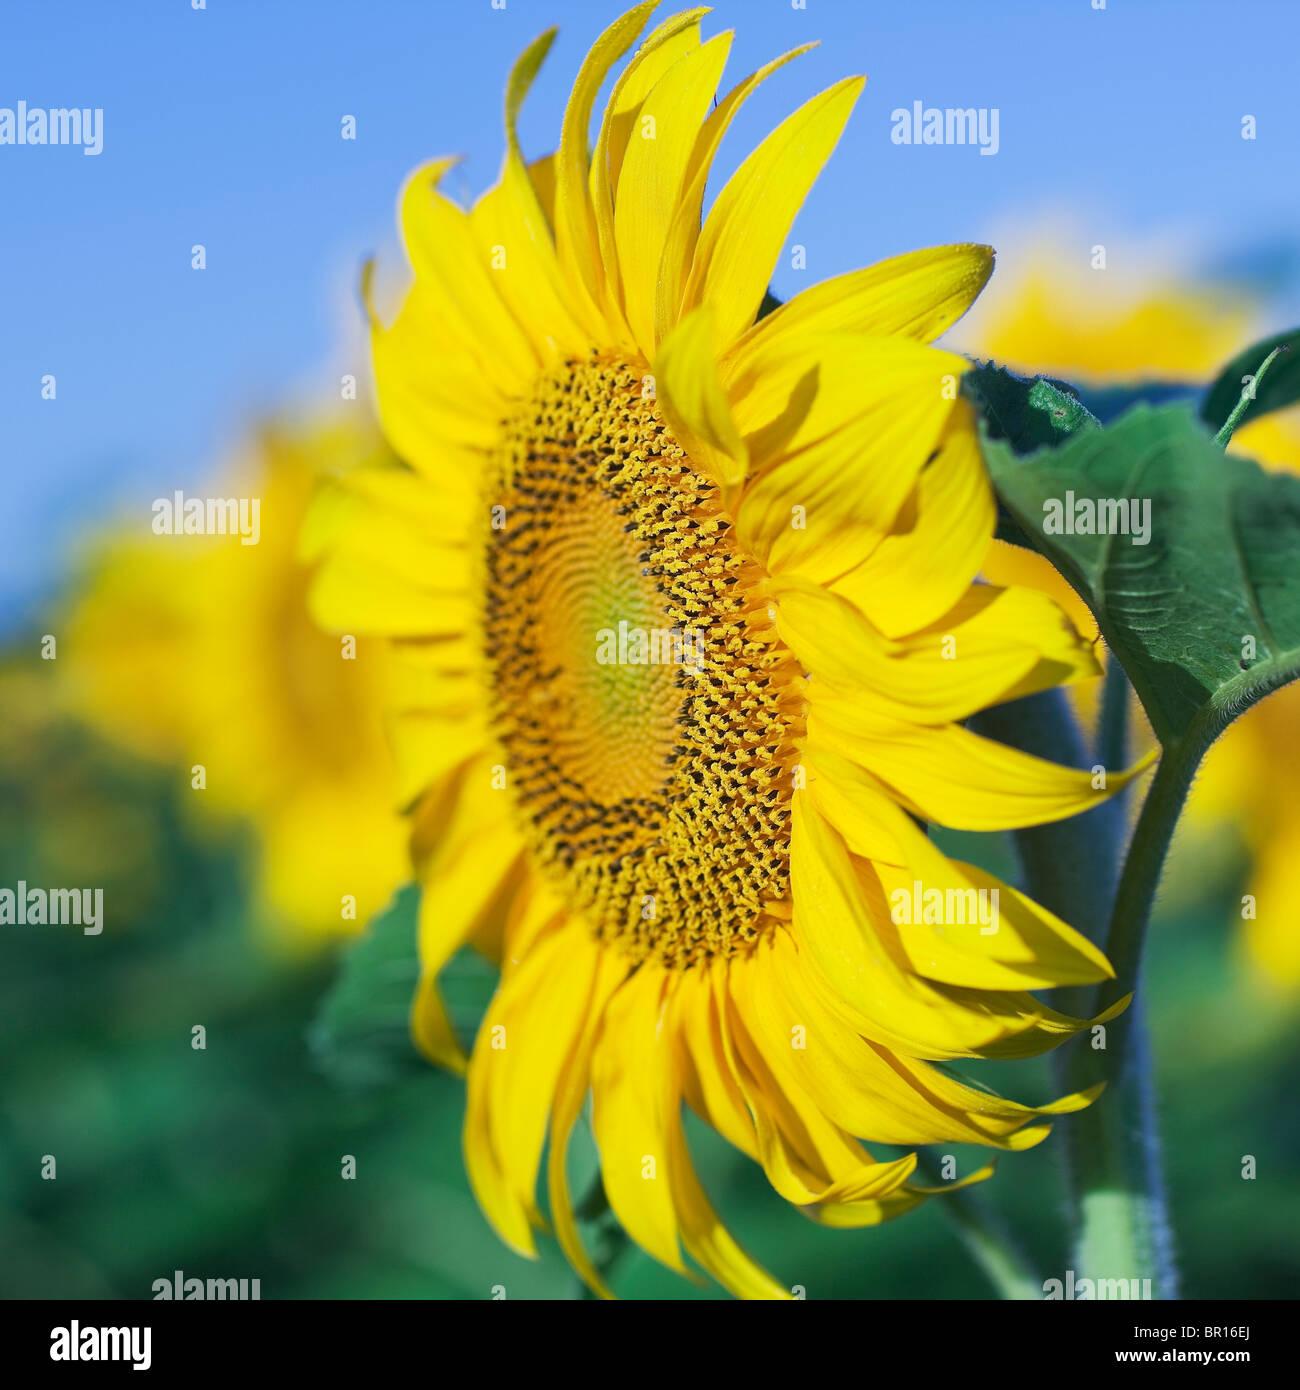 Sunflowers against blue sky, Manitoba, Canada - Stock Image